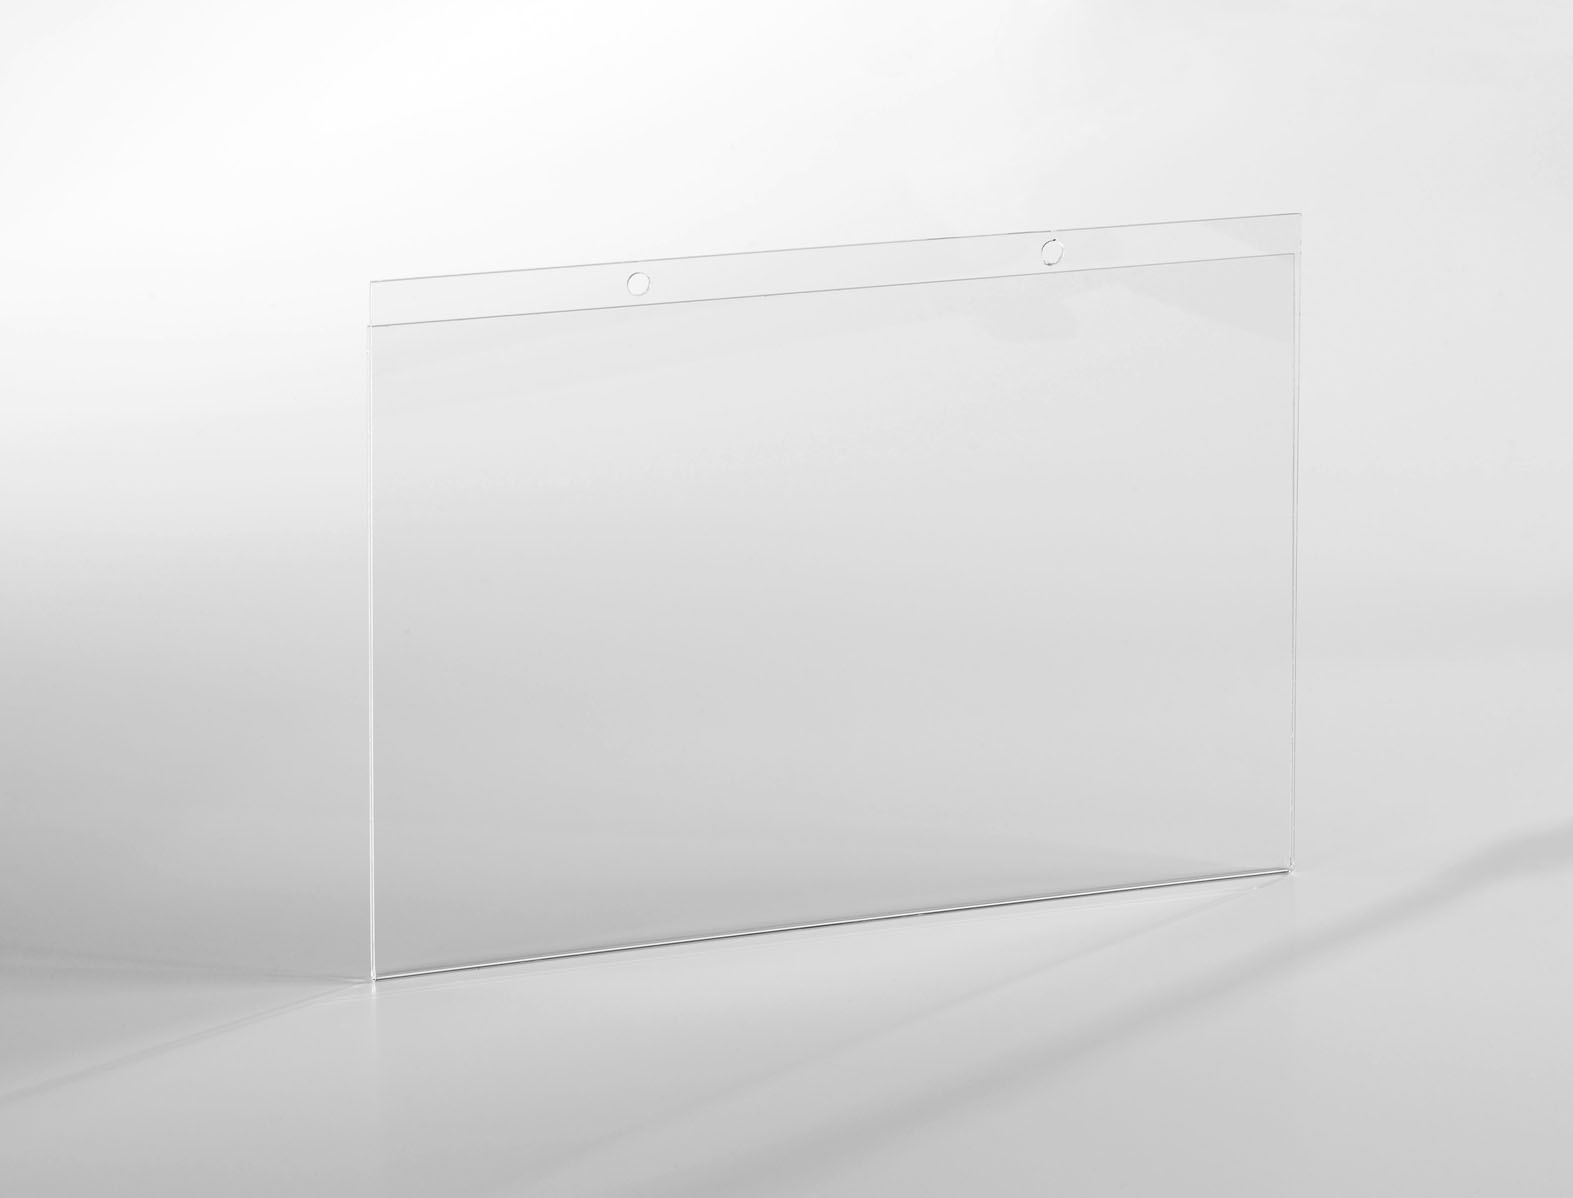 porte affichette a3 paysage fixation par vis en plexiglas. Black Bedroom Furniture Sets. Home Design Ideas